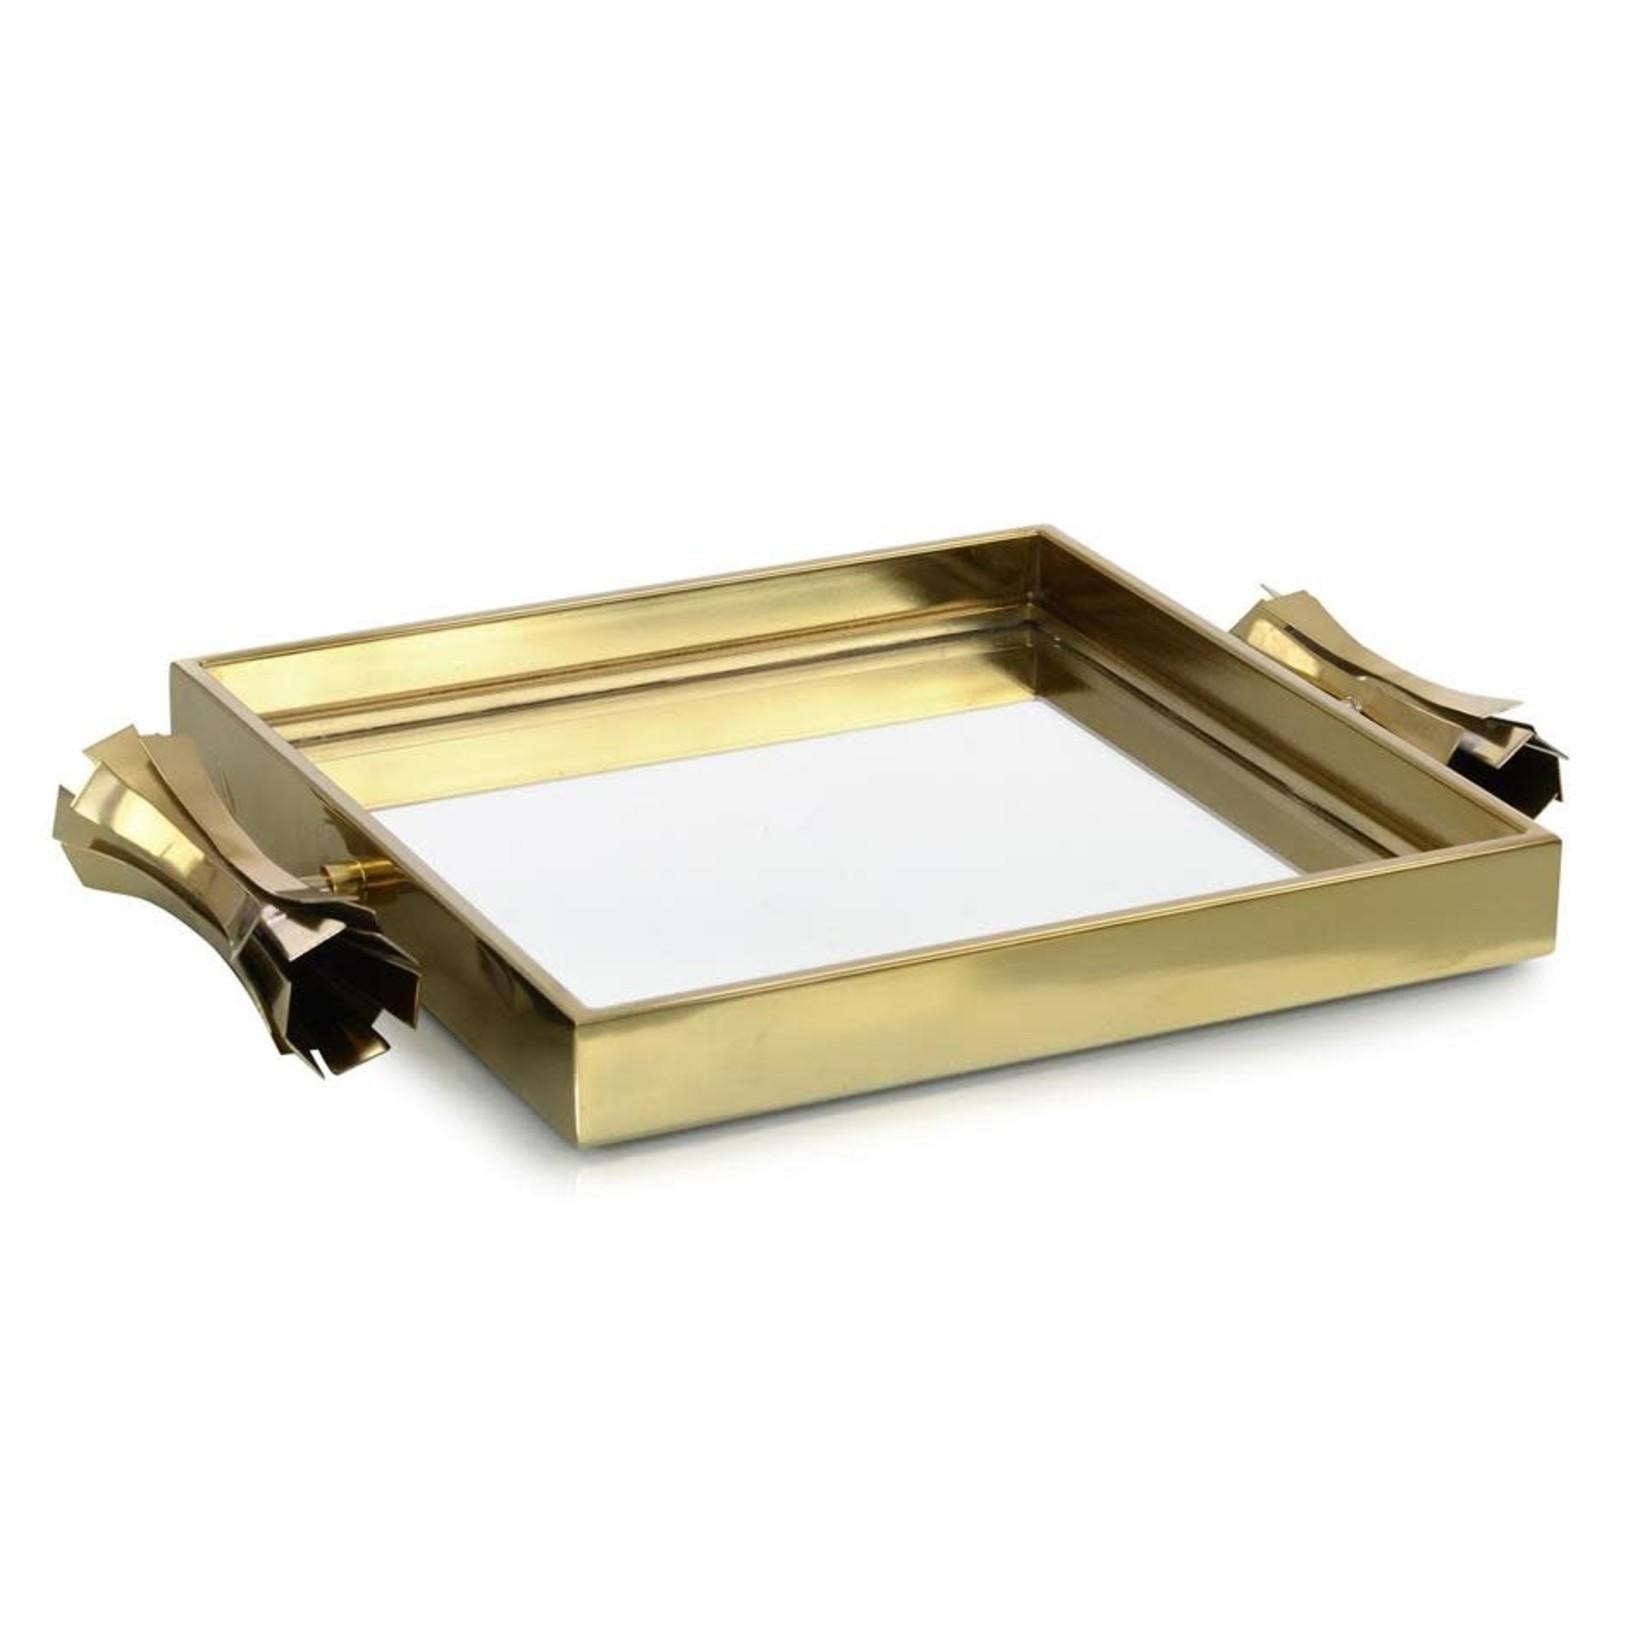 John Richard Square Brass Mirrored Tray II